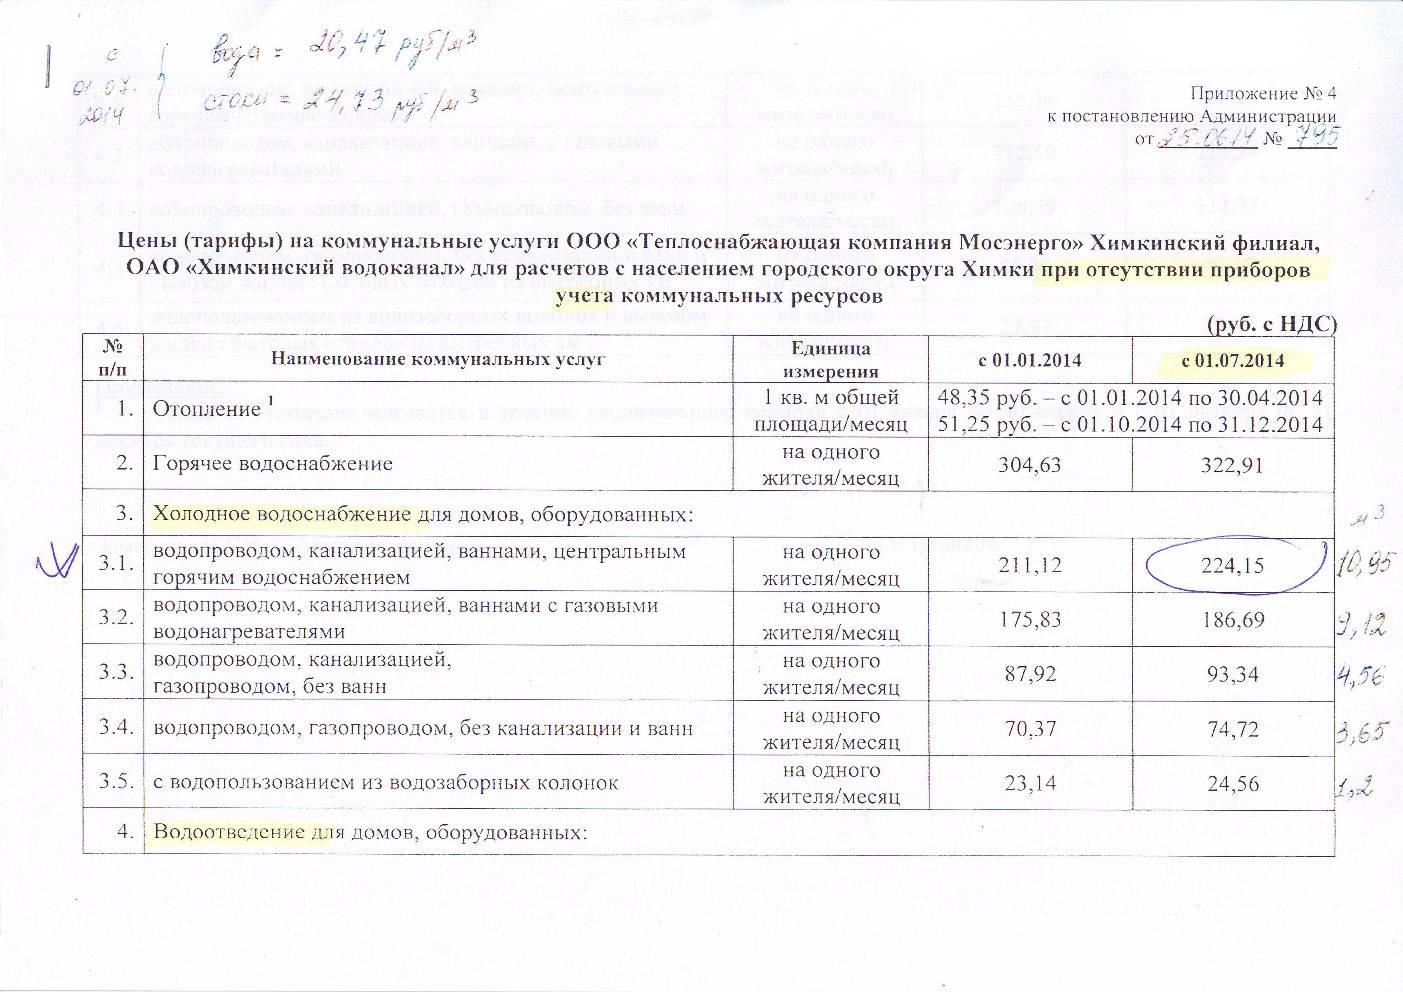 Тарифы на воду Новиков 3